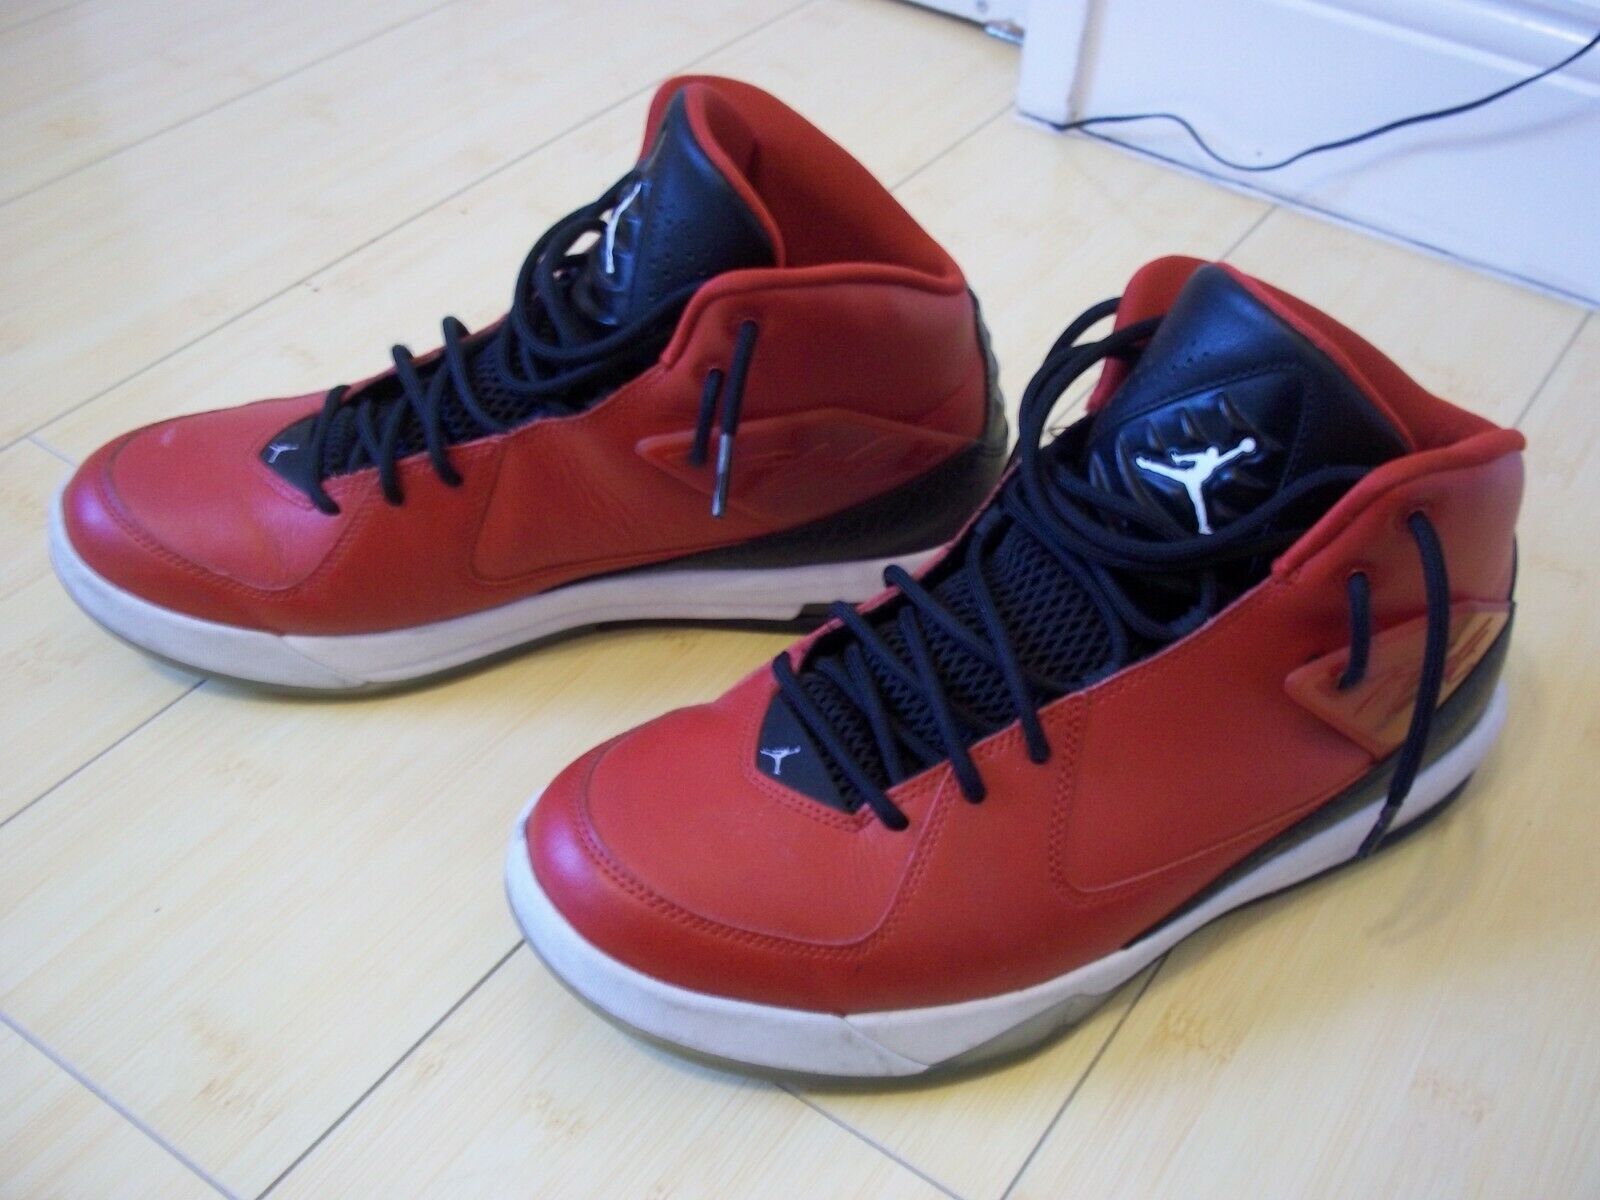 5db15e6765 MENS NIKE AIR JORDAN SNEAKERS INCLINE FLIGHT 705796-600 SZ 10.5 RED  BASKETBALL nxorpk948-Athletic Shoes